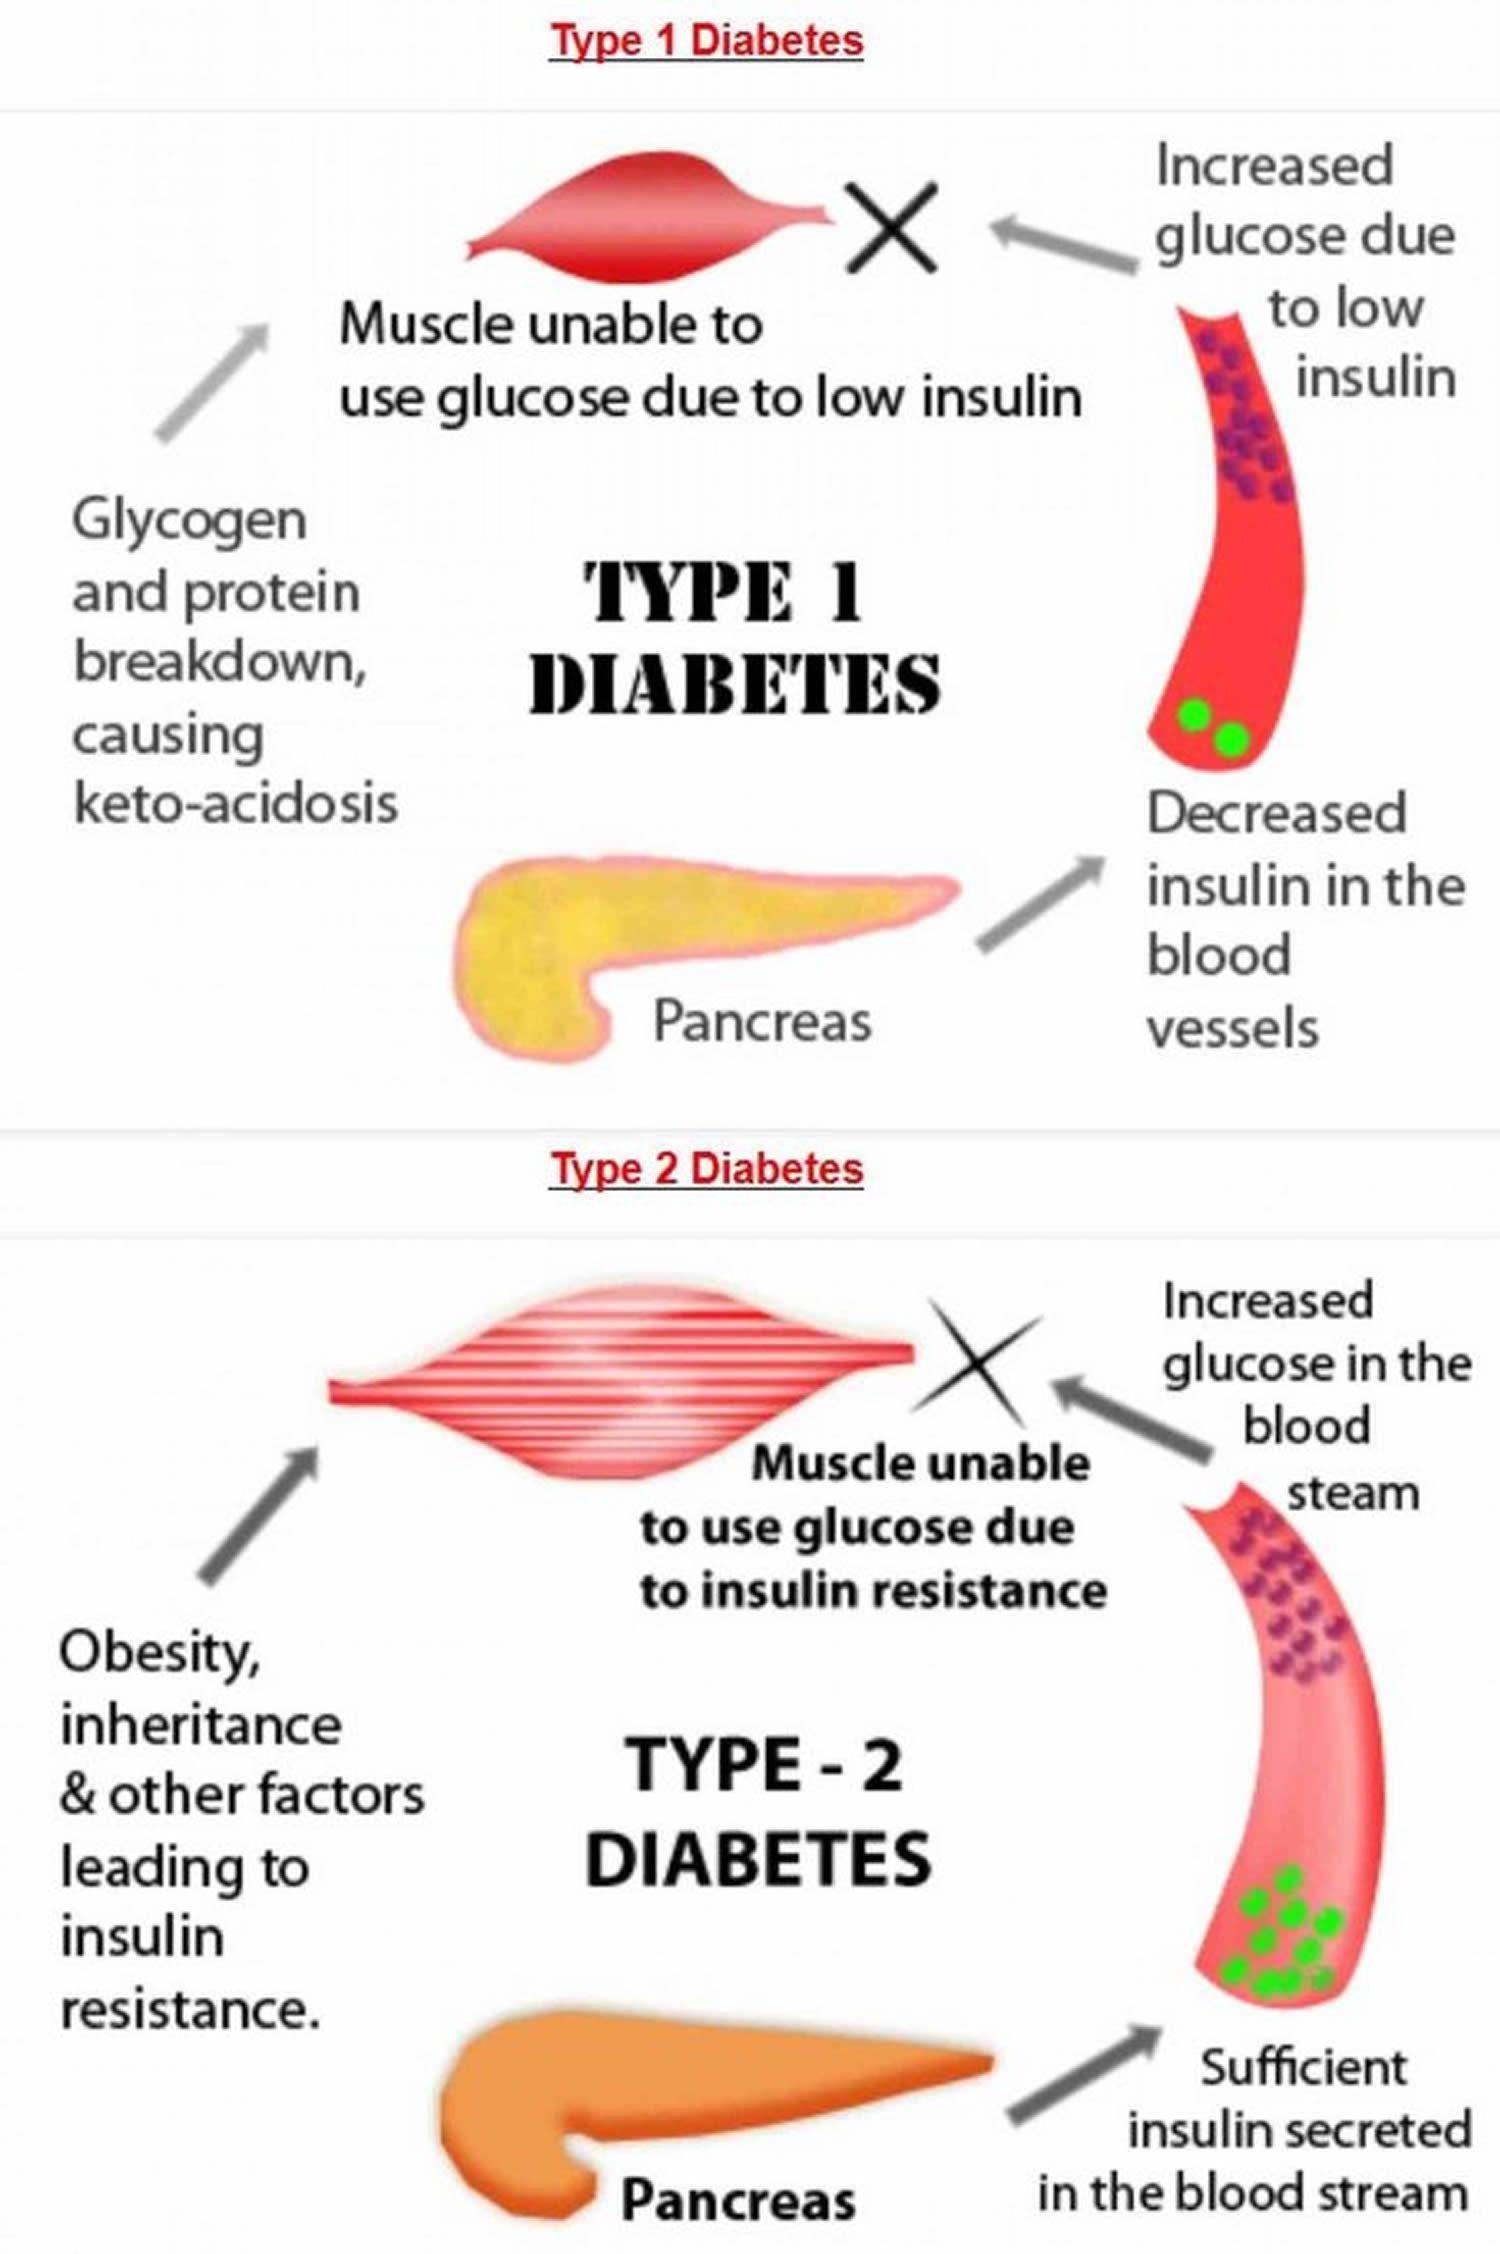 type 2 diabetes mellitus diet plantype 2 diabetes mellitus